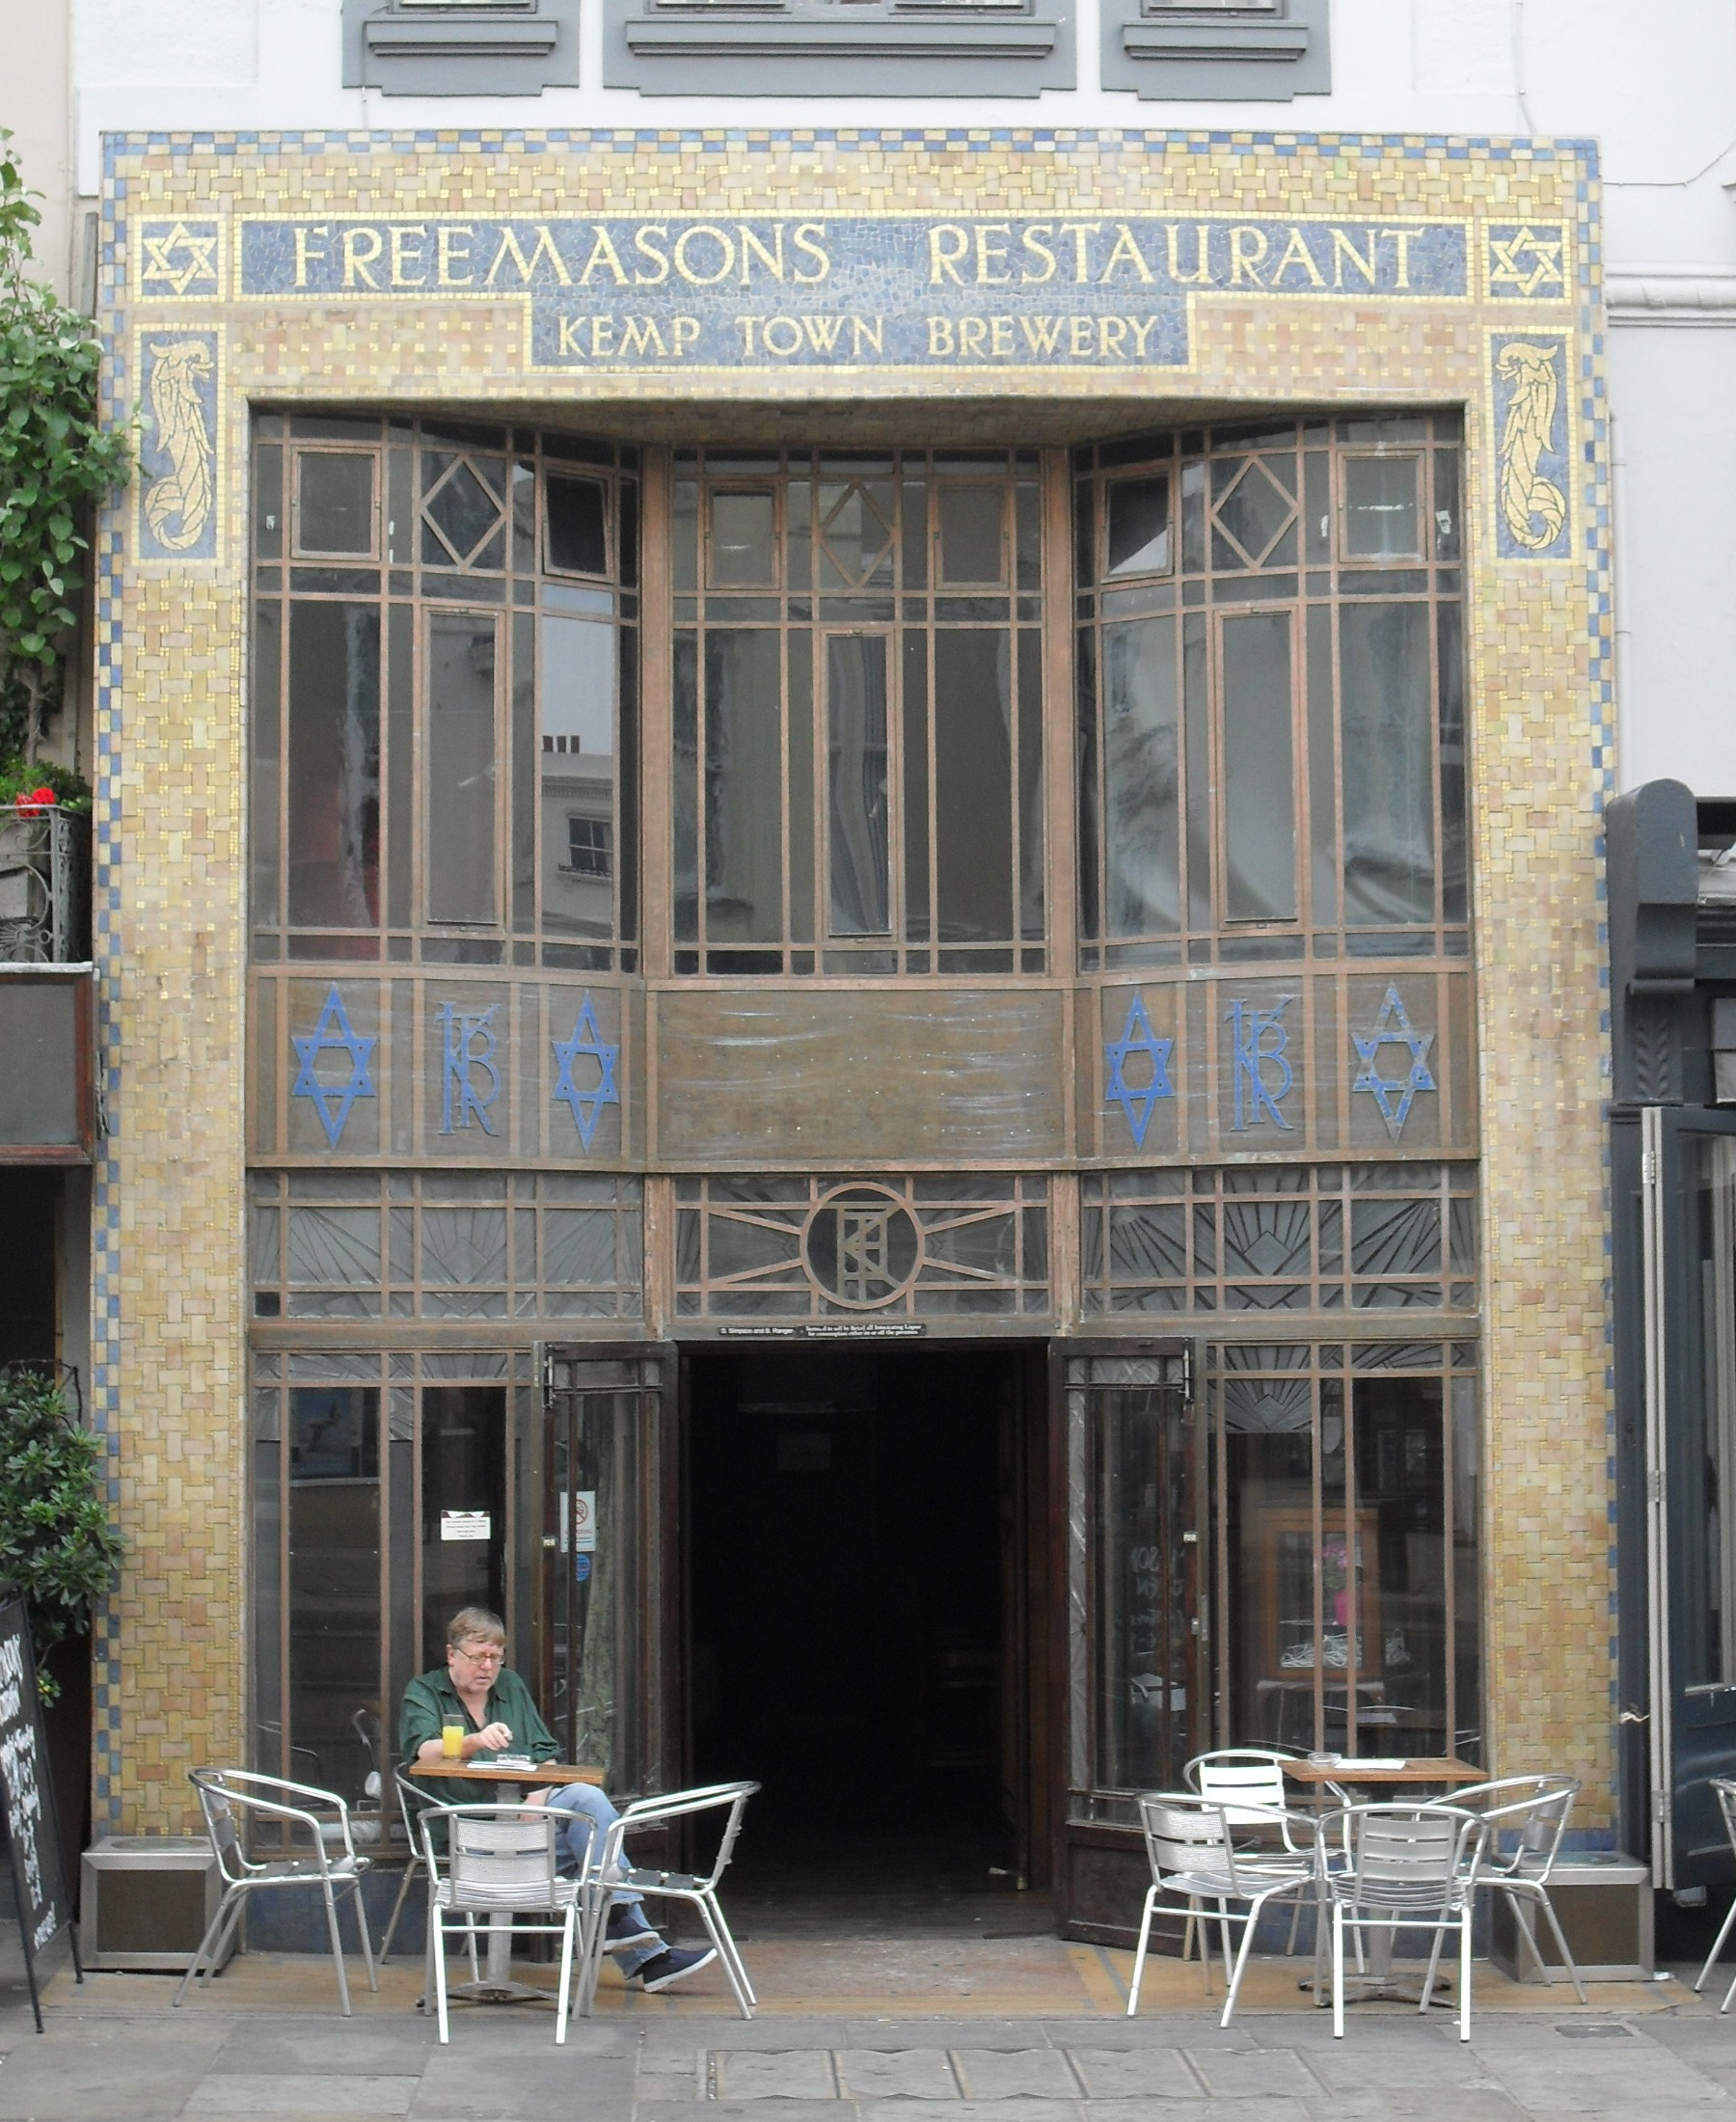 http://upload.wikimedia.org/wikipedia/commons/4/42/Freemasons_Restaurant,_Western_Road,_Hove_(Restaurant_Façade).jpg